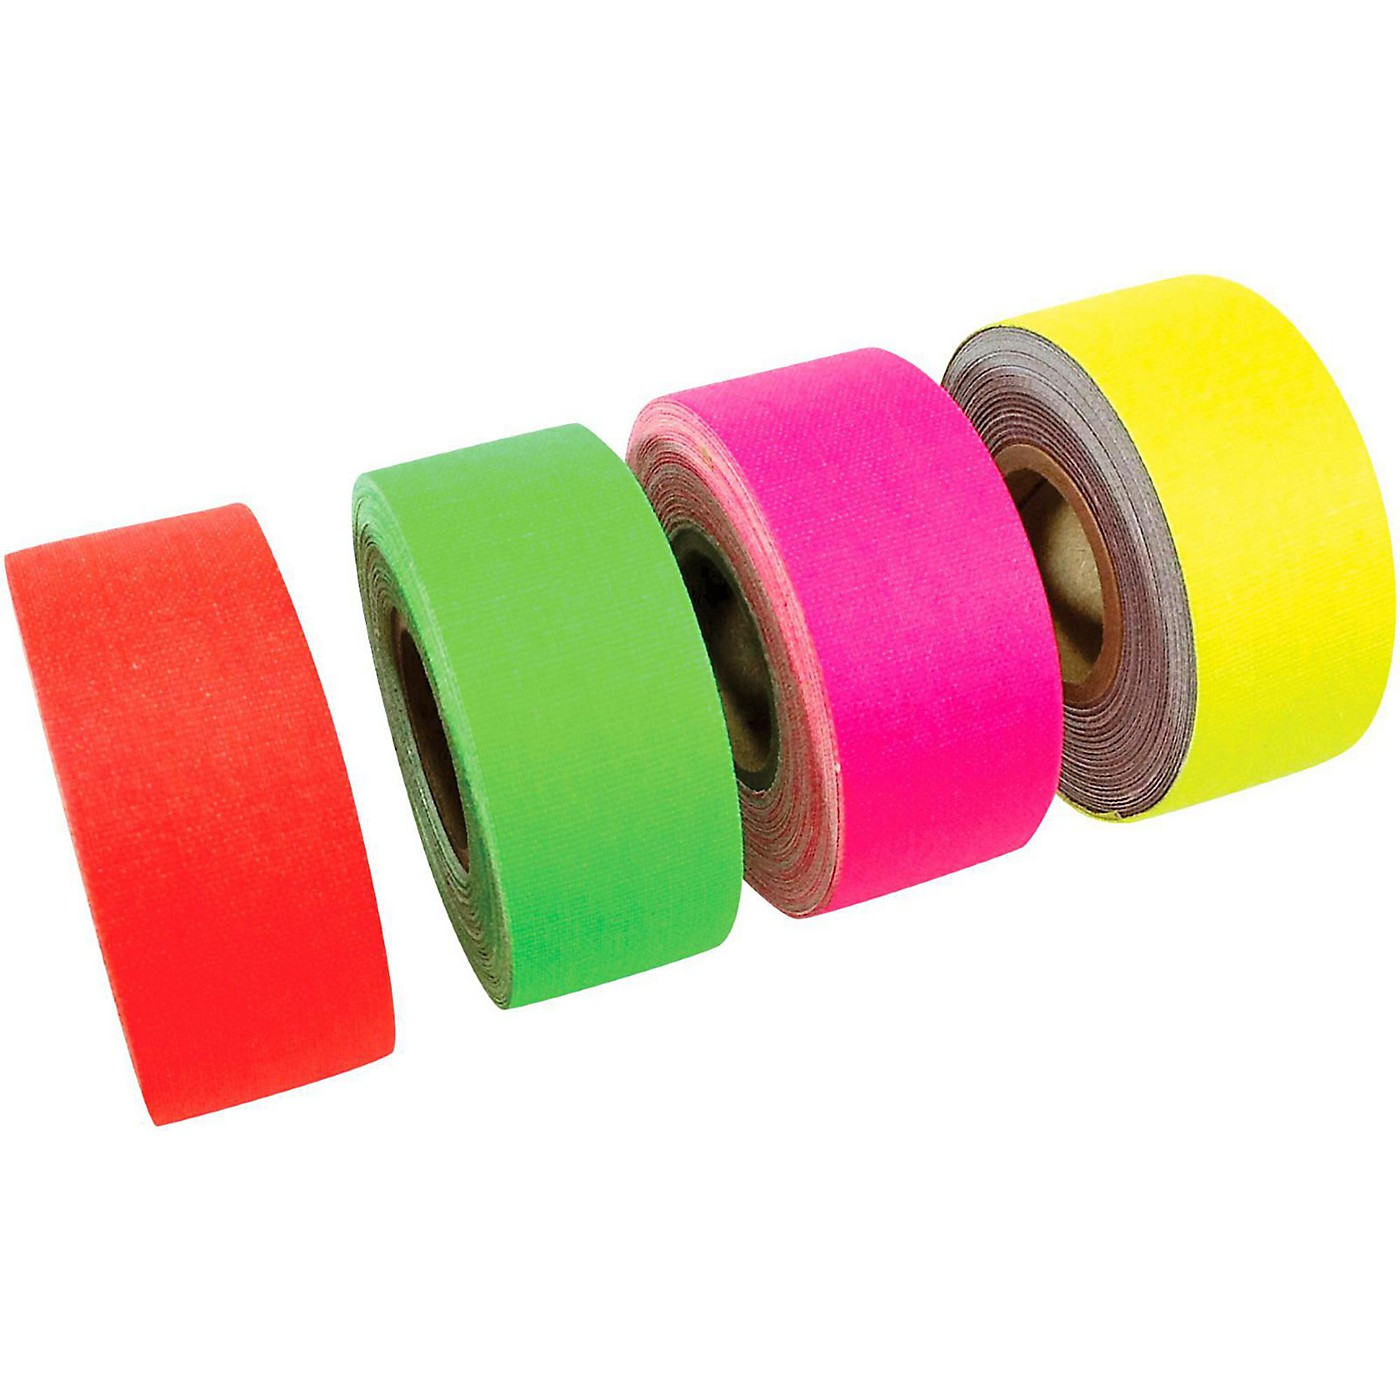 American Recorder Technologies Mini Roll Gaffers Tape 1 In x 8 Yards - Green, Yellow, Pink, Orange thumbnail